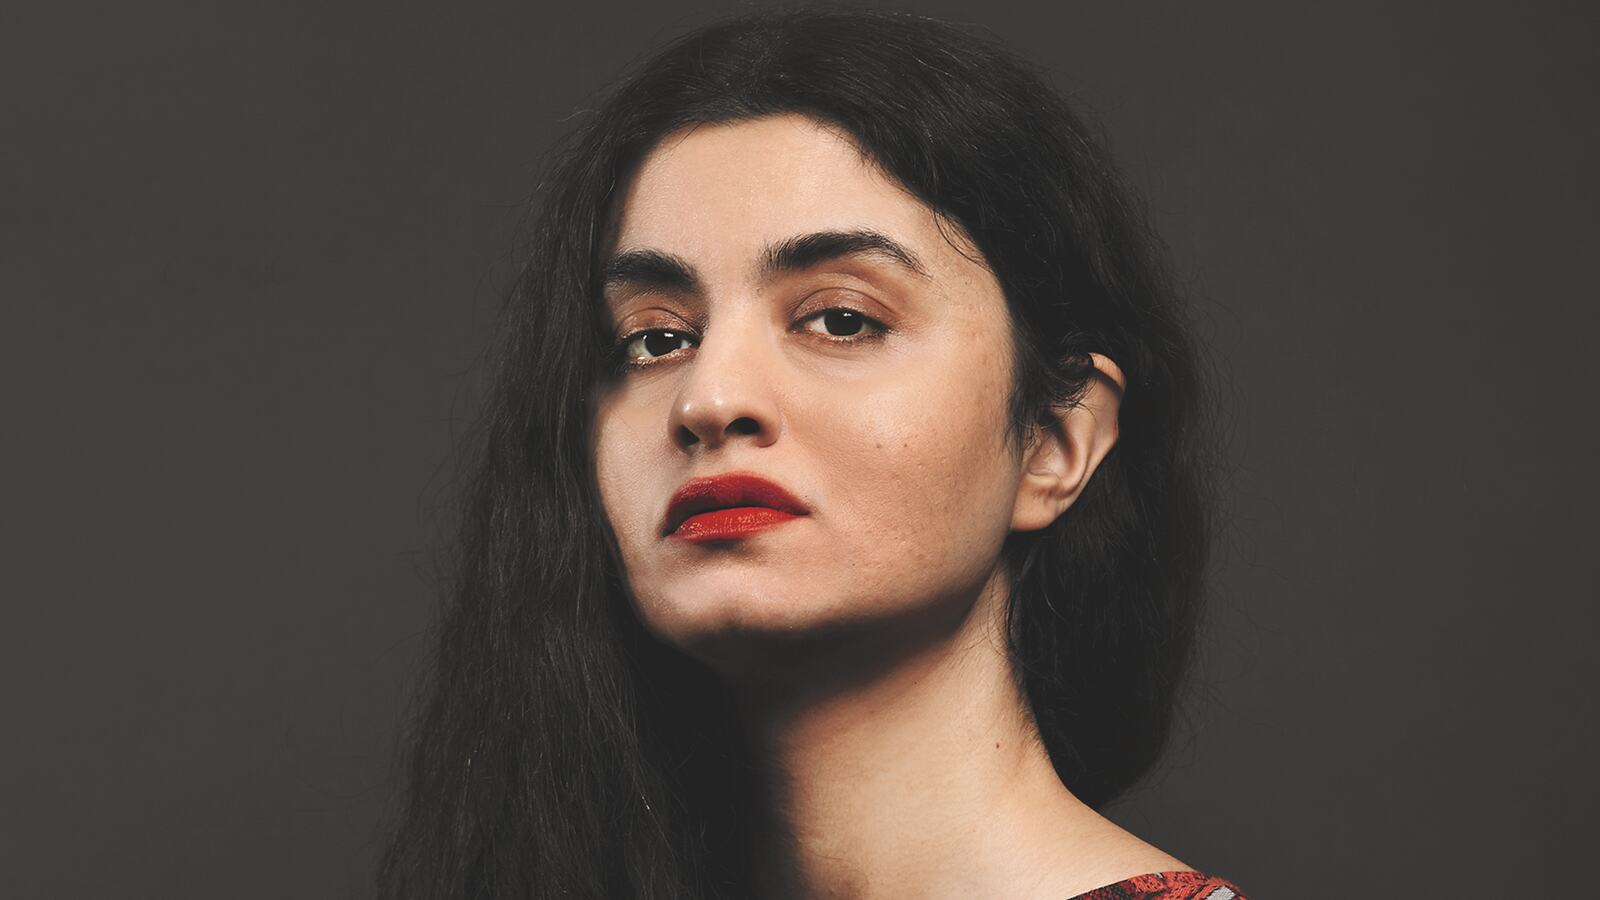 Samra Habib, author and activist